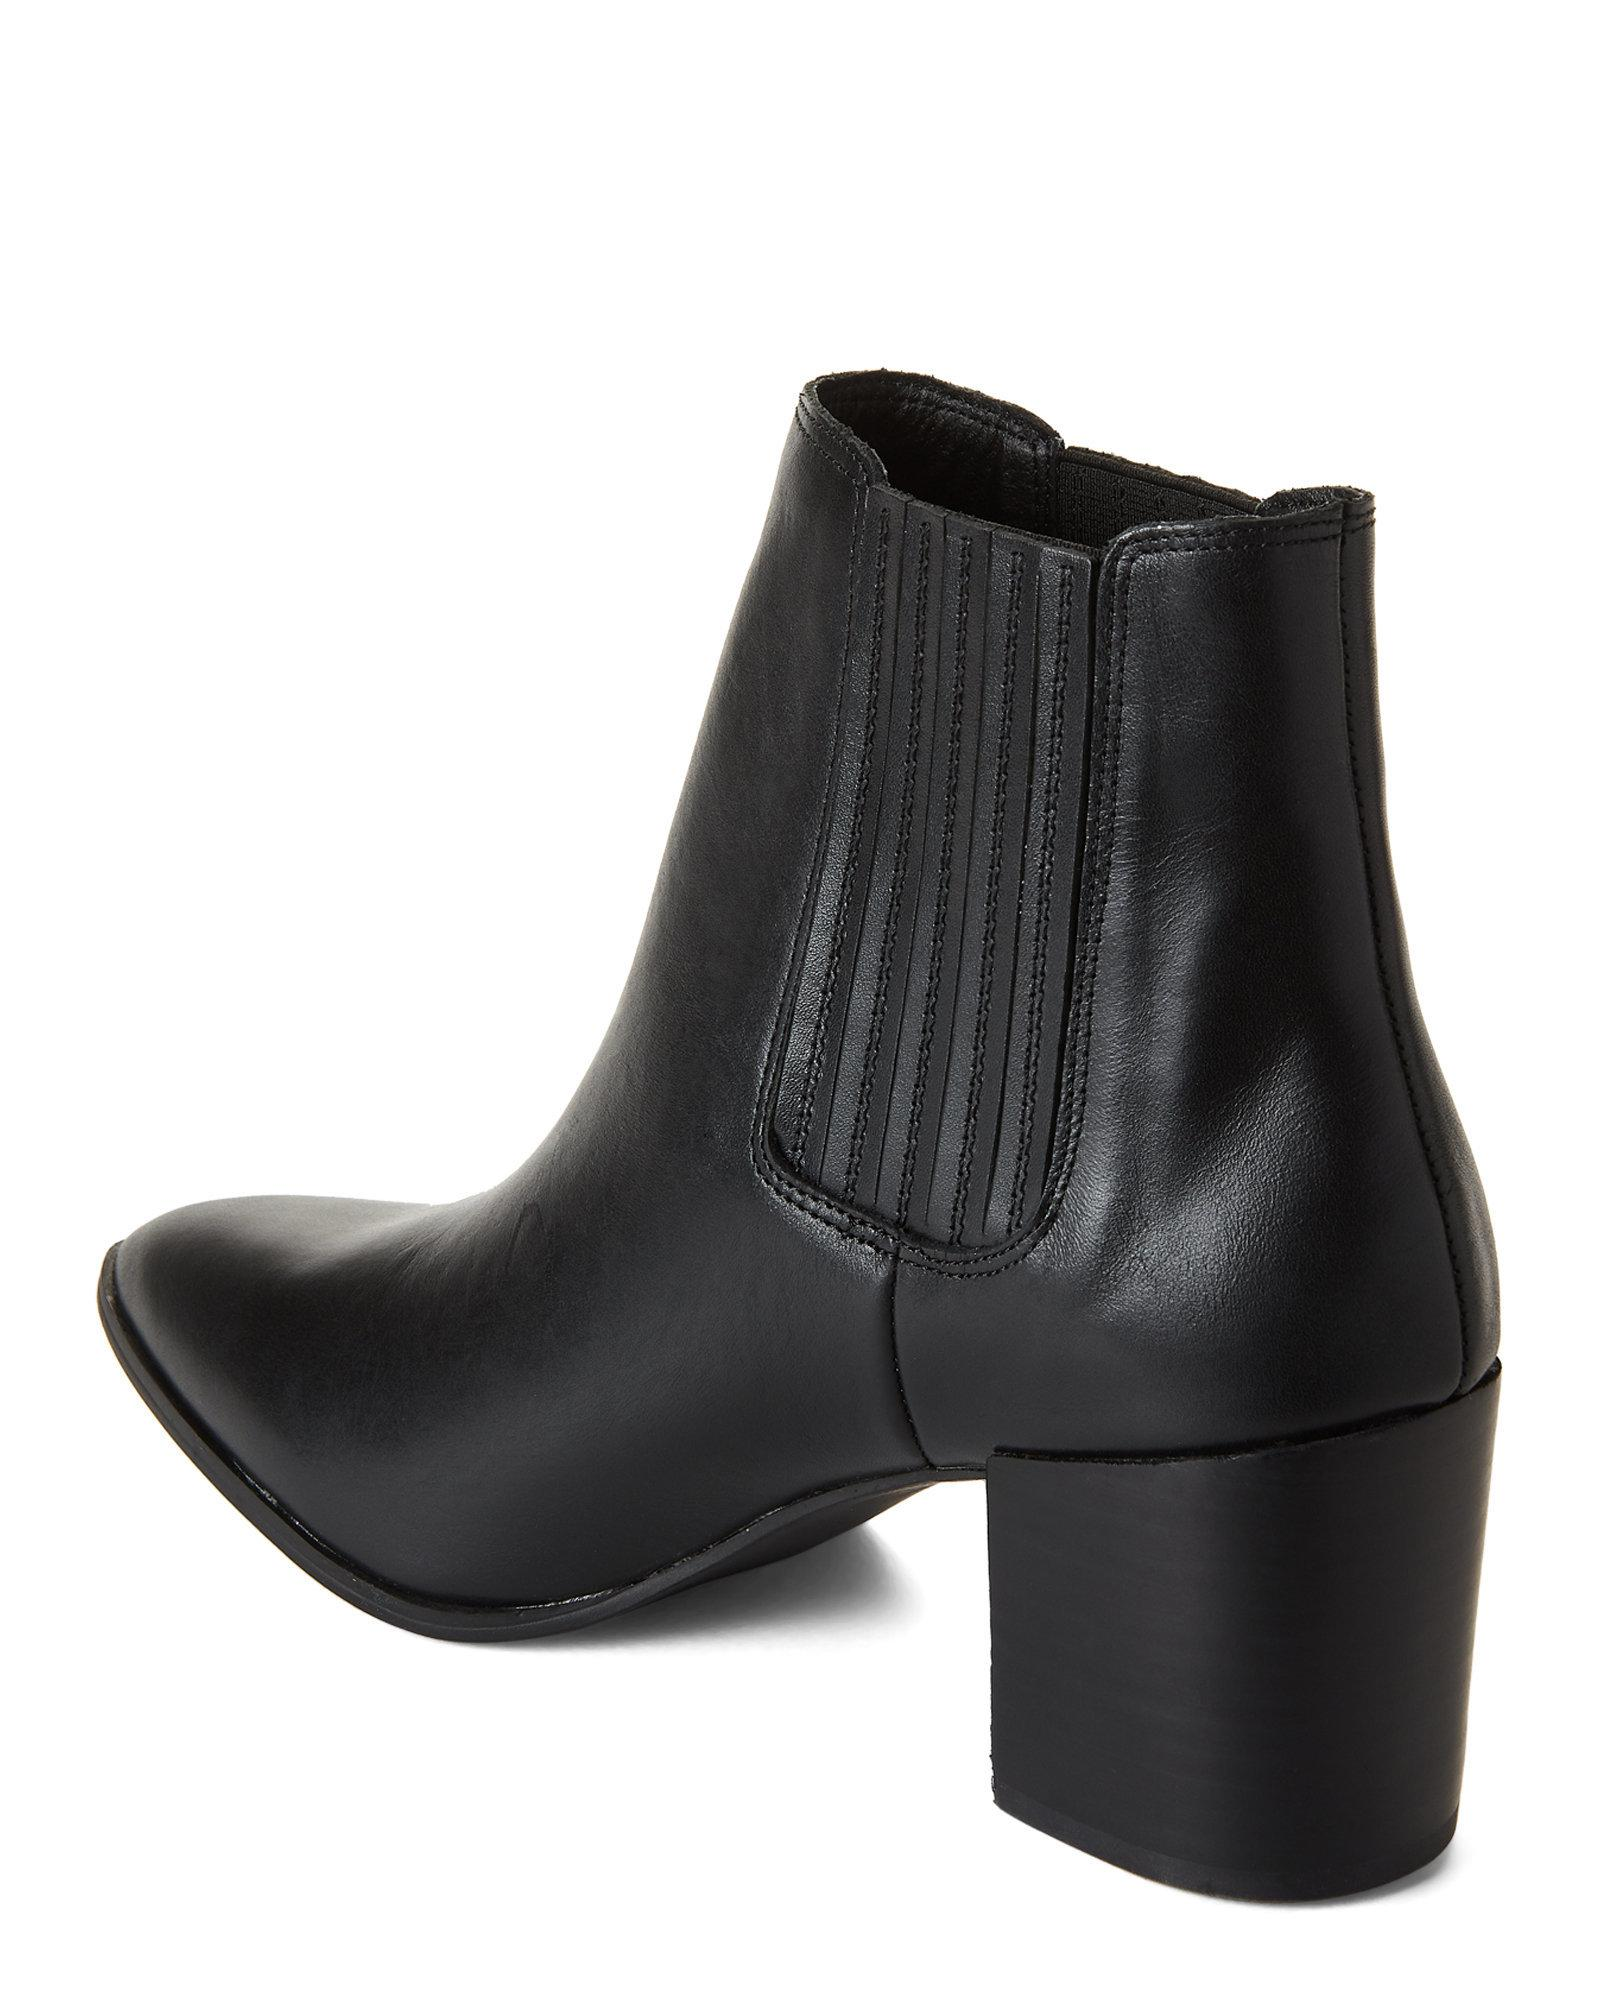 a54a3f226fb Steve Madden Black Jain Leather Short Booties